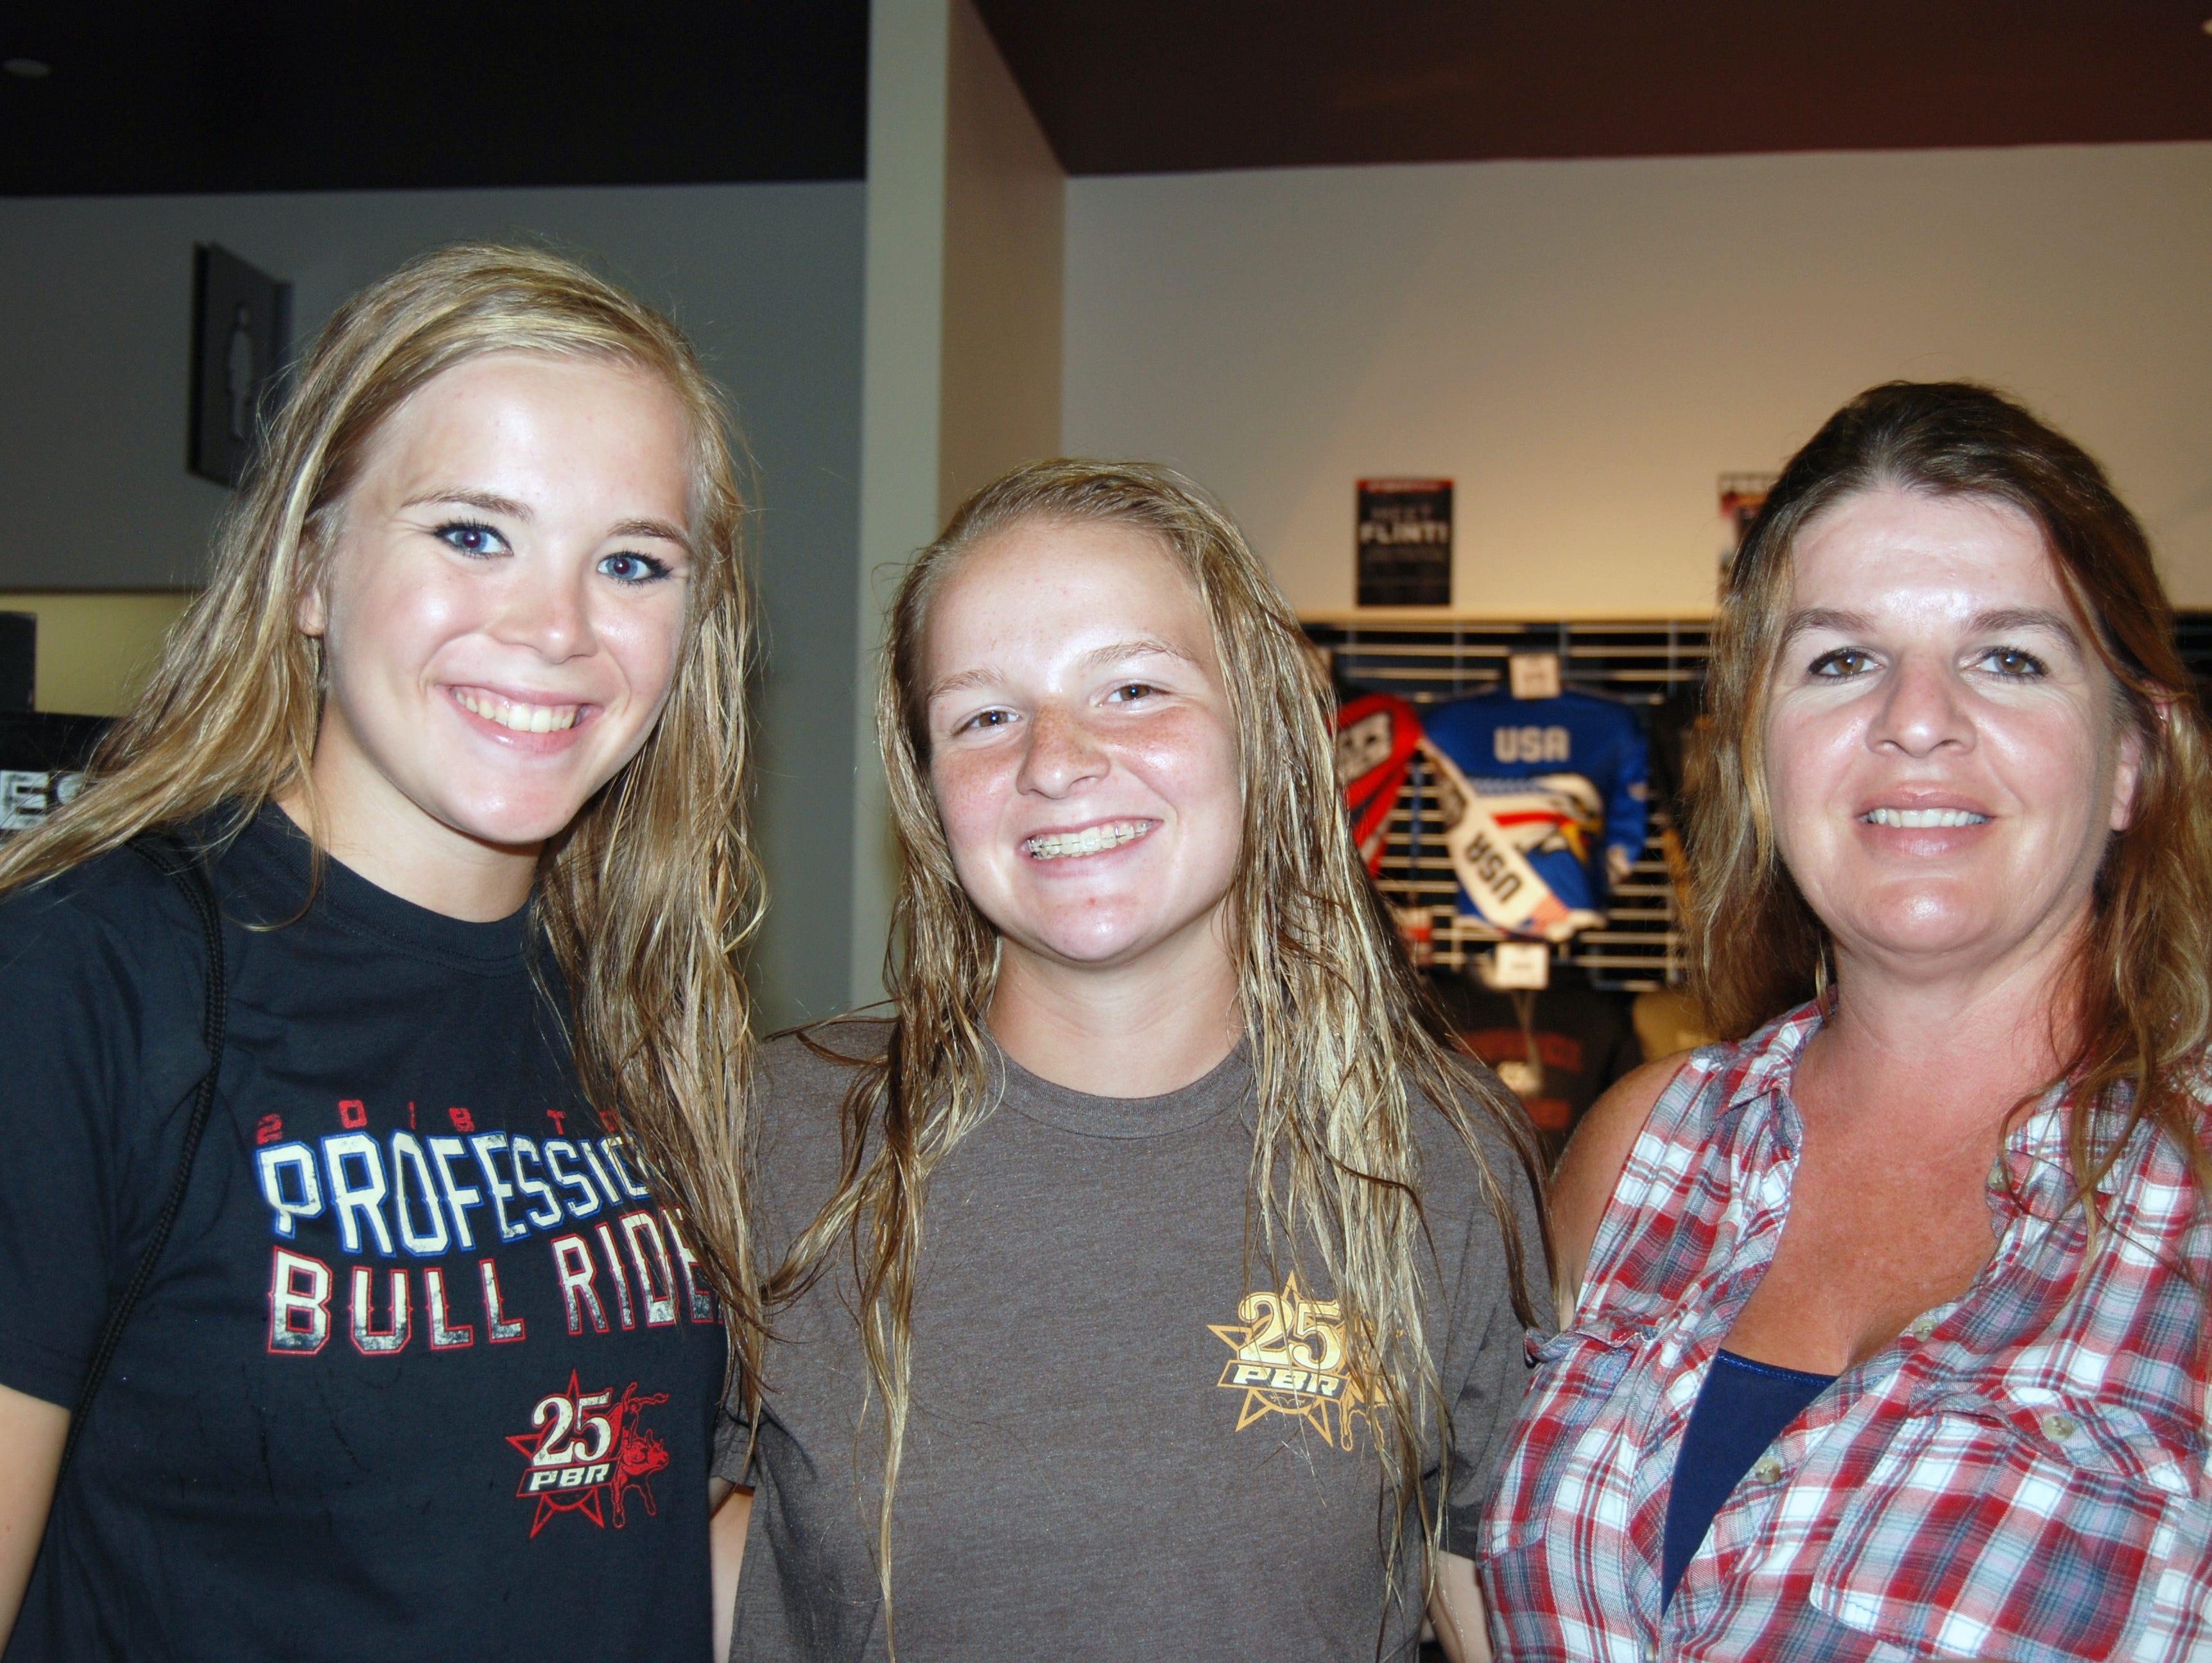 Danni, Liz and Patty Stewart